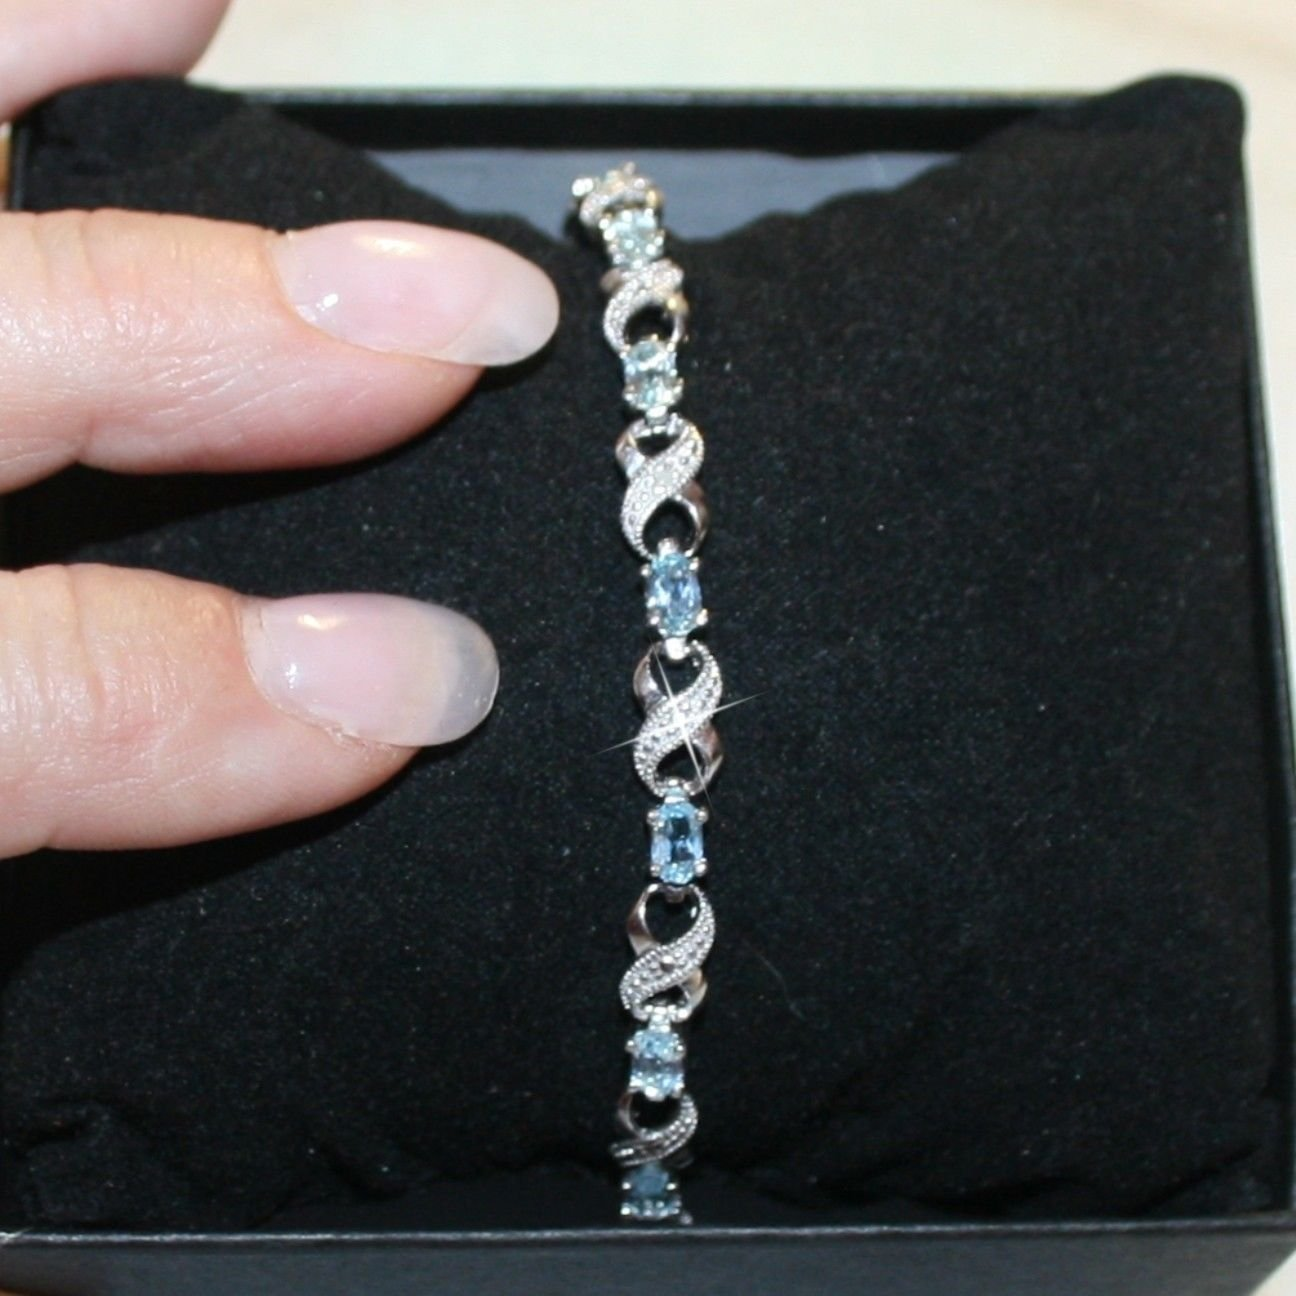 Blue Topaz Gemstone X O Tennis Bracelet 14k White Gold over 925 SS